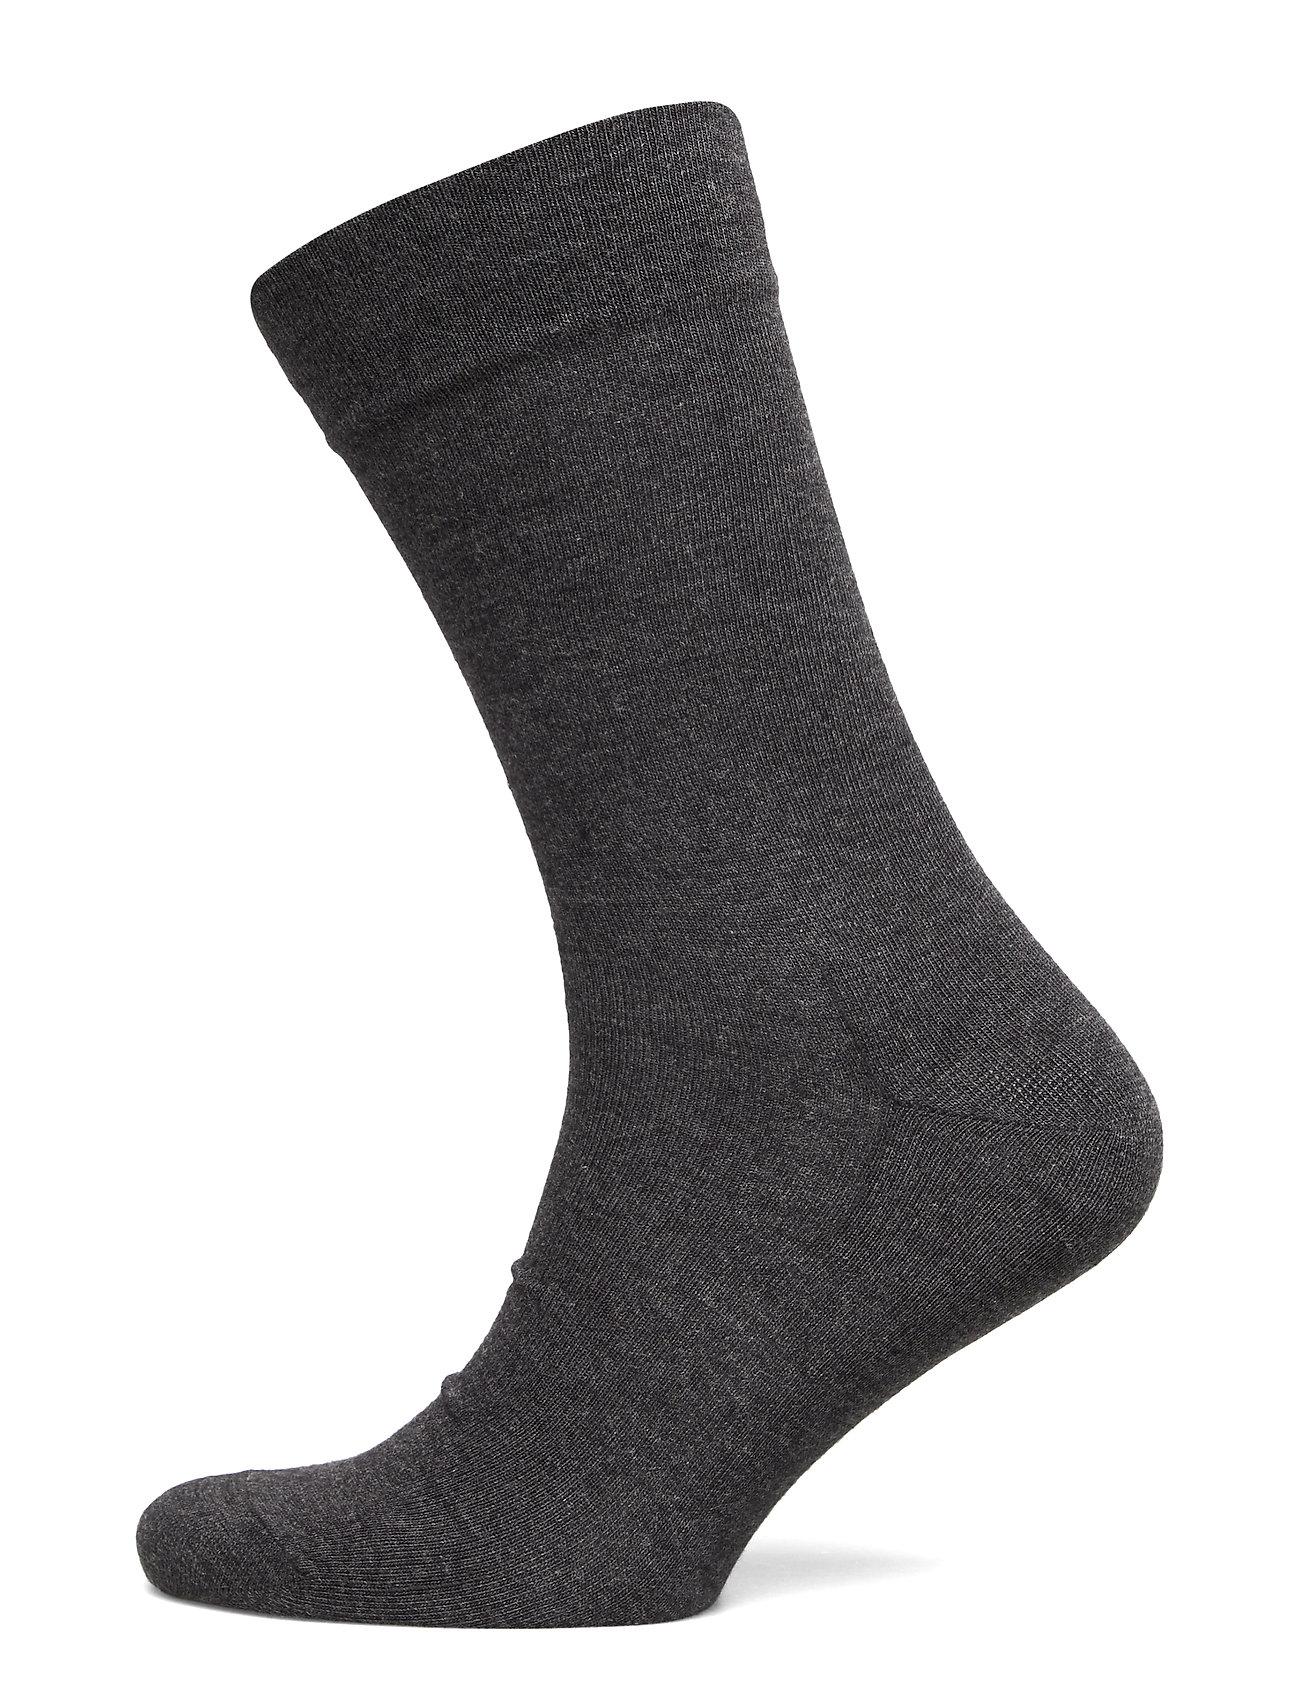 Egtved Egtved socks bamboo no elastic - GREY